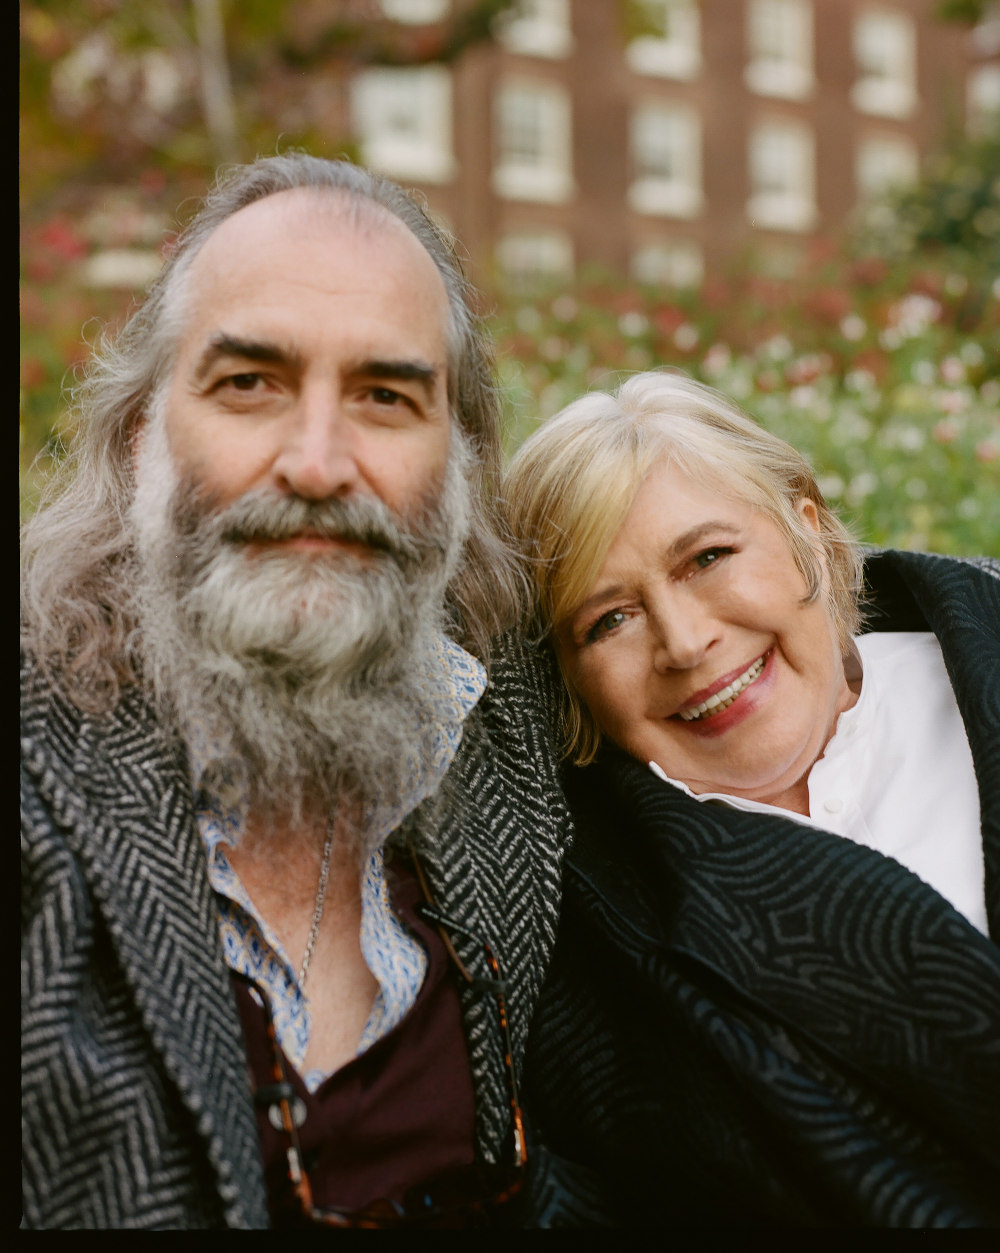 Marianne-Faithfull-and-Warren-Ellis-2-Photocredit-Rosie-Matheson-1000px